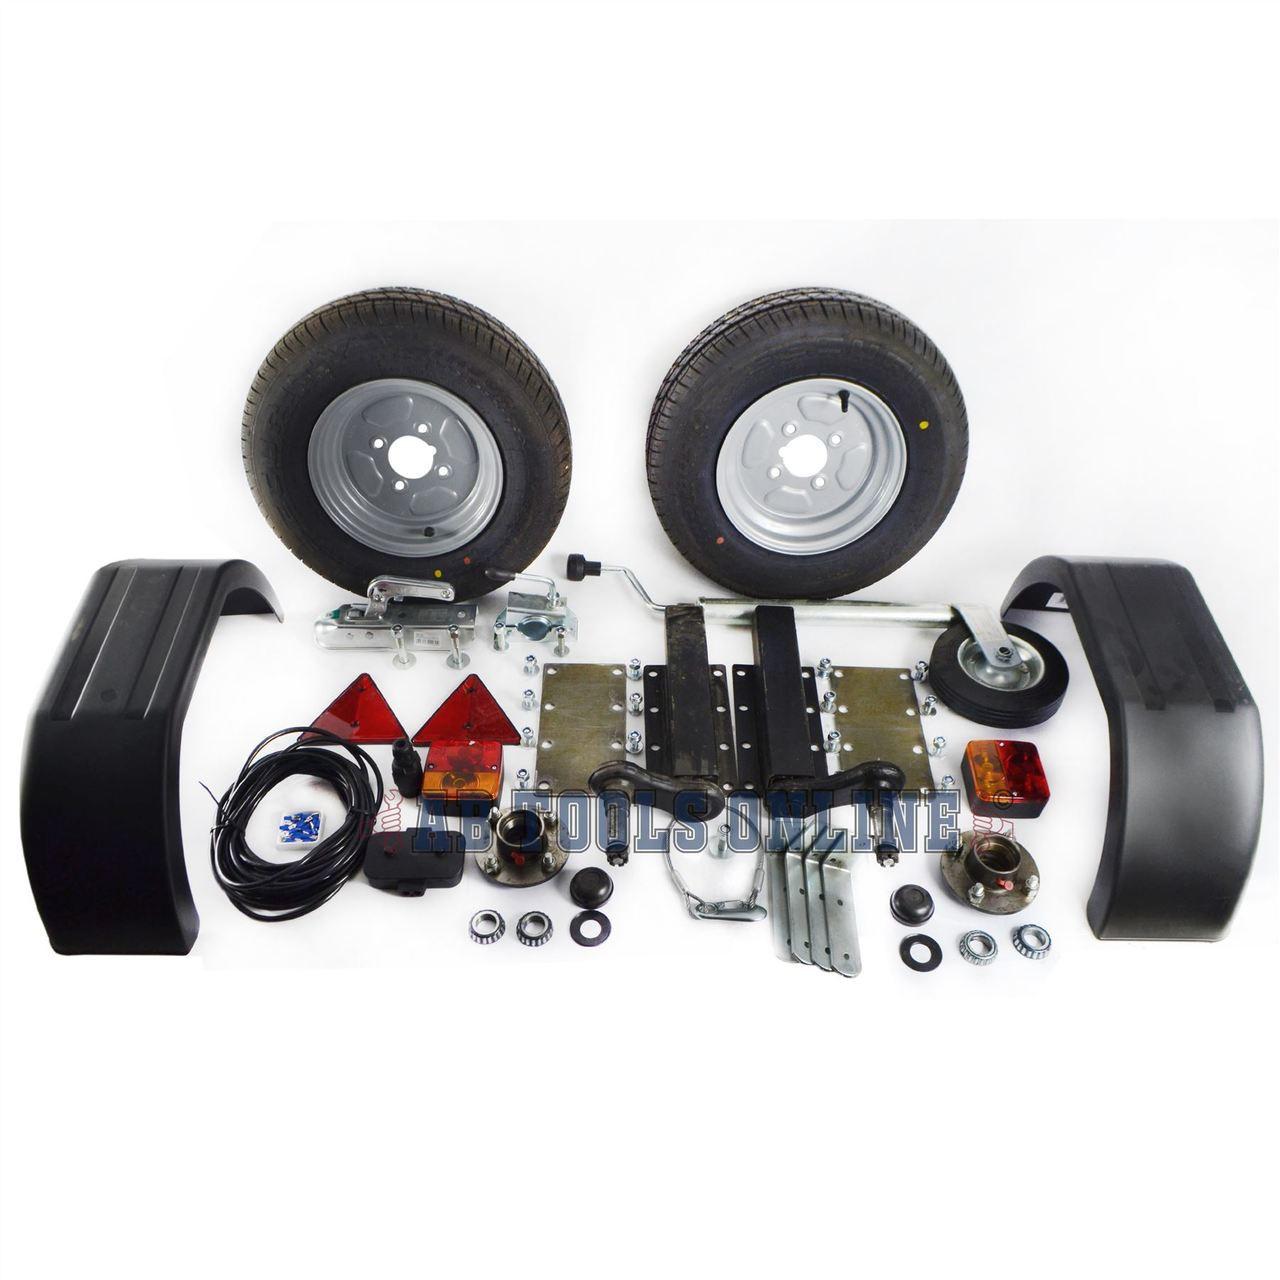 750Kg Trailer Kit Suspension Units Hitch Lights Mudguards Towing 5m ...